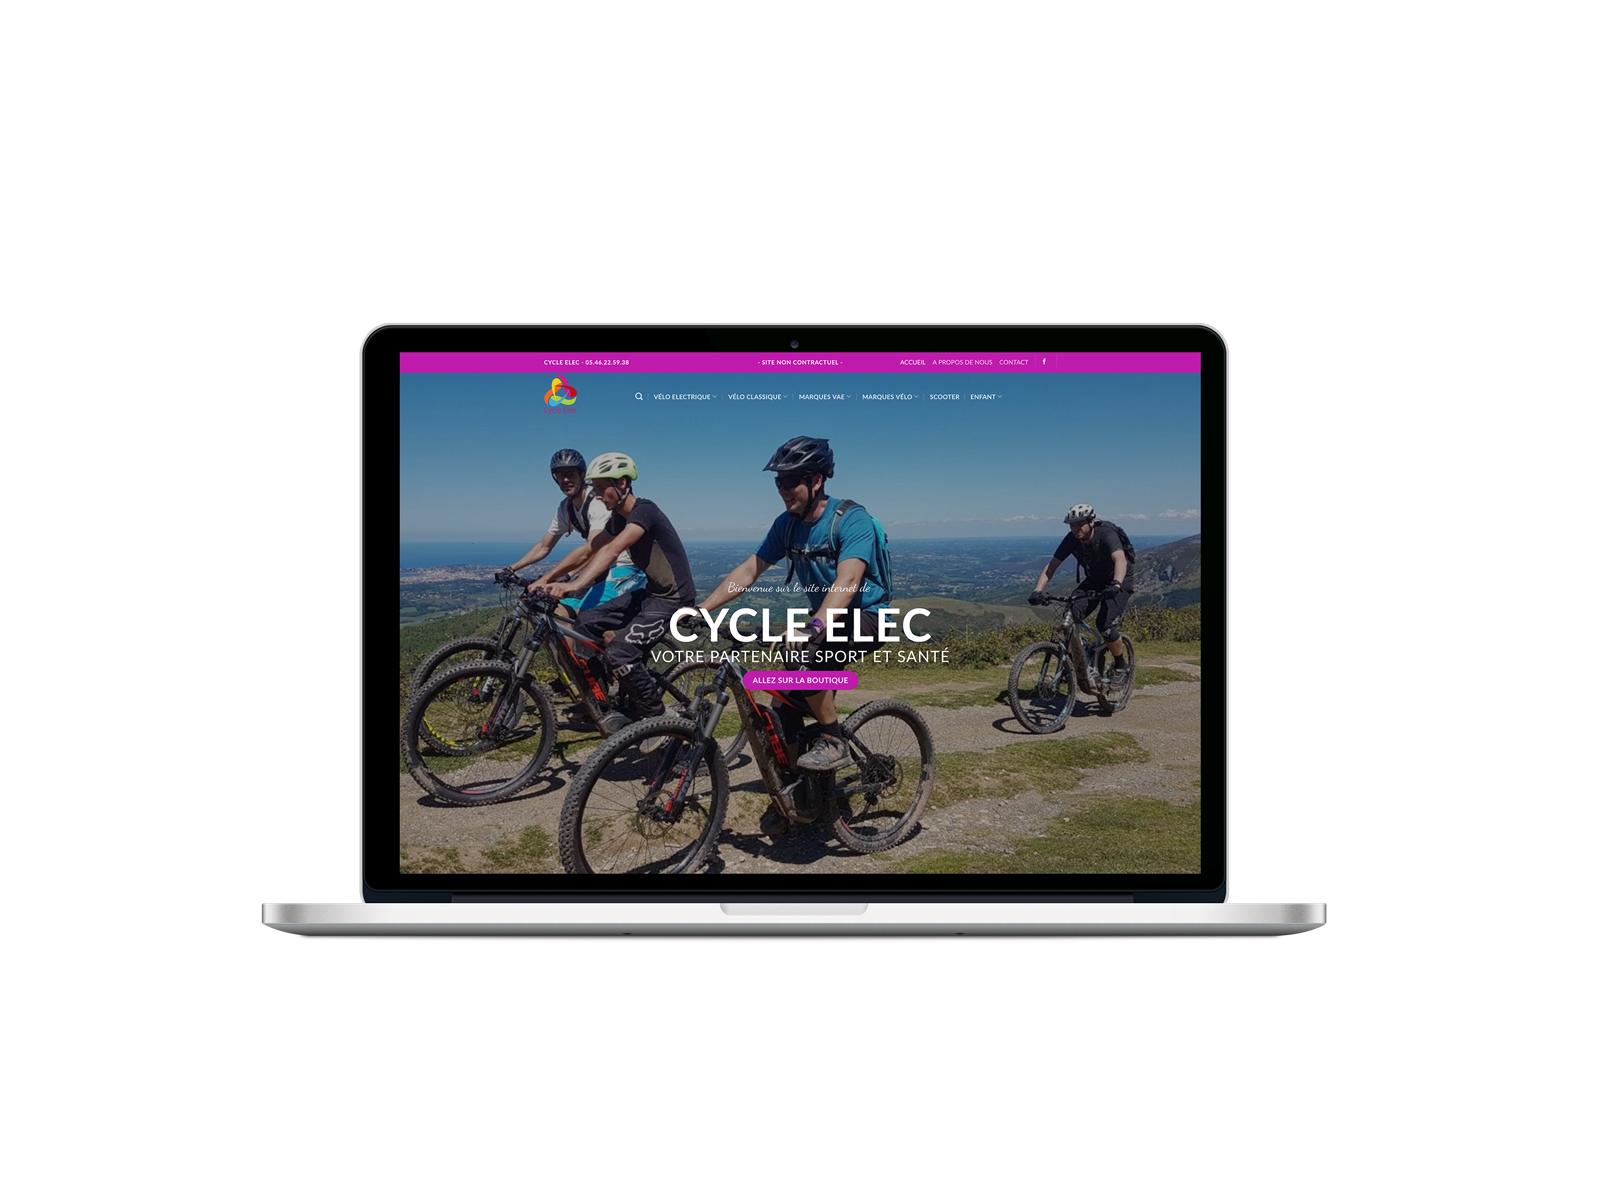 Cycle-elec